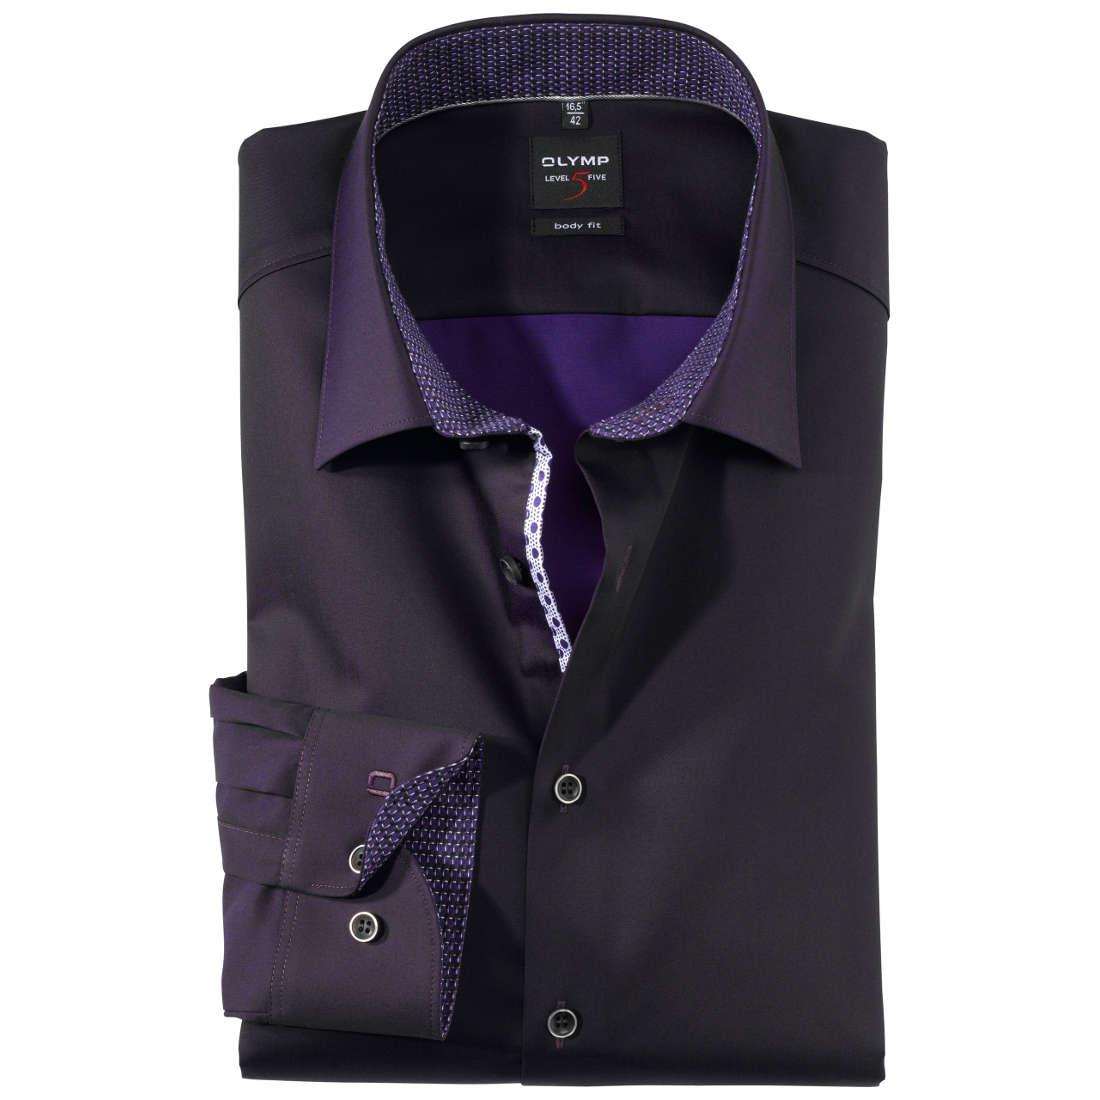 olymp overhemd body fit 207684 in het lila overhemden. Black Bedroom Furniture Sets. Home Design Ideas